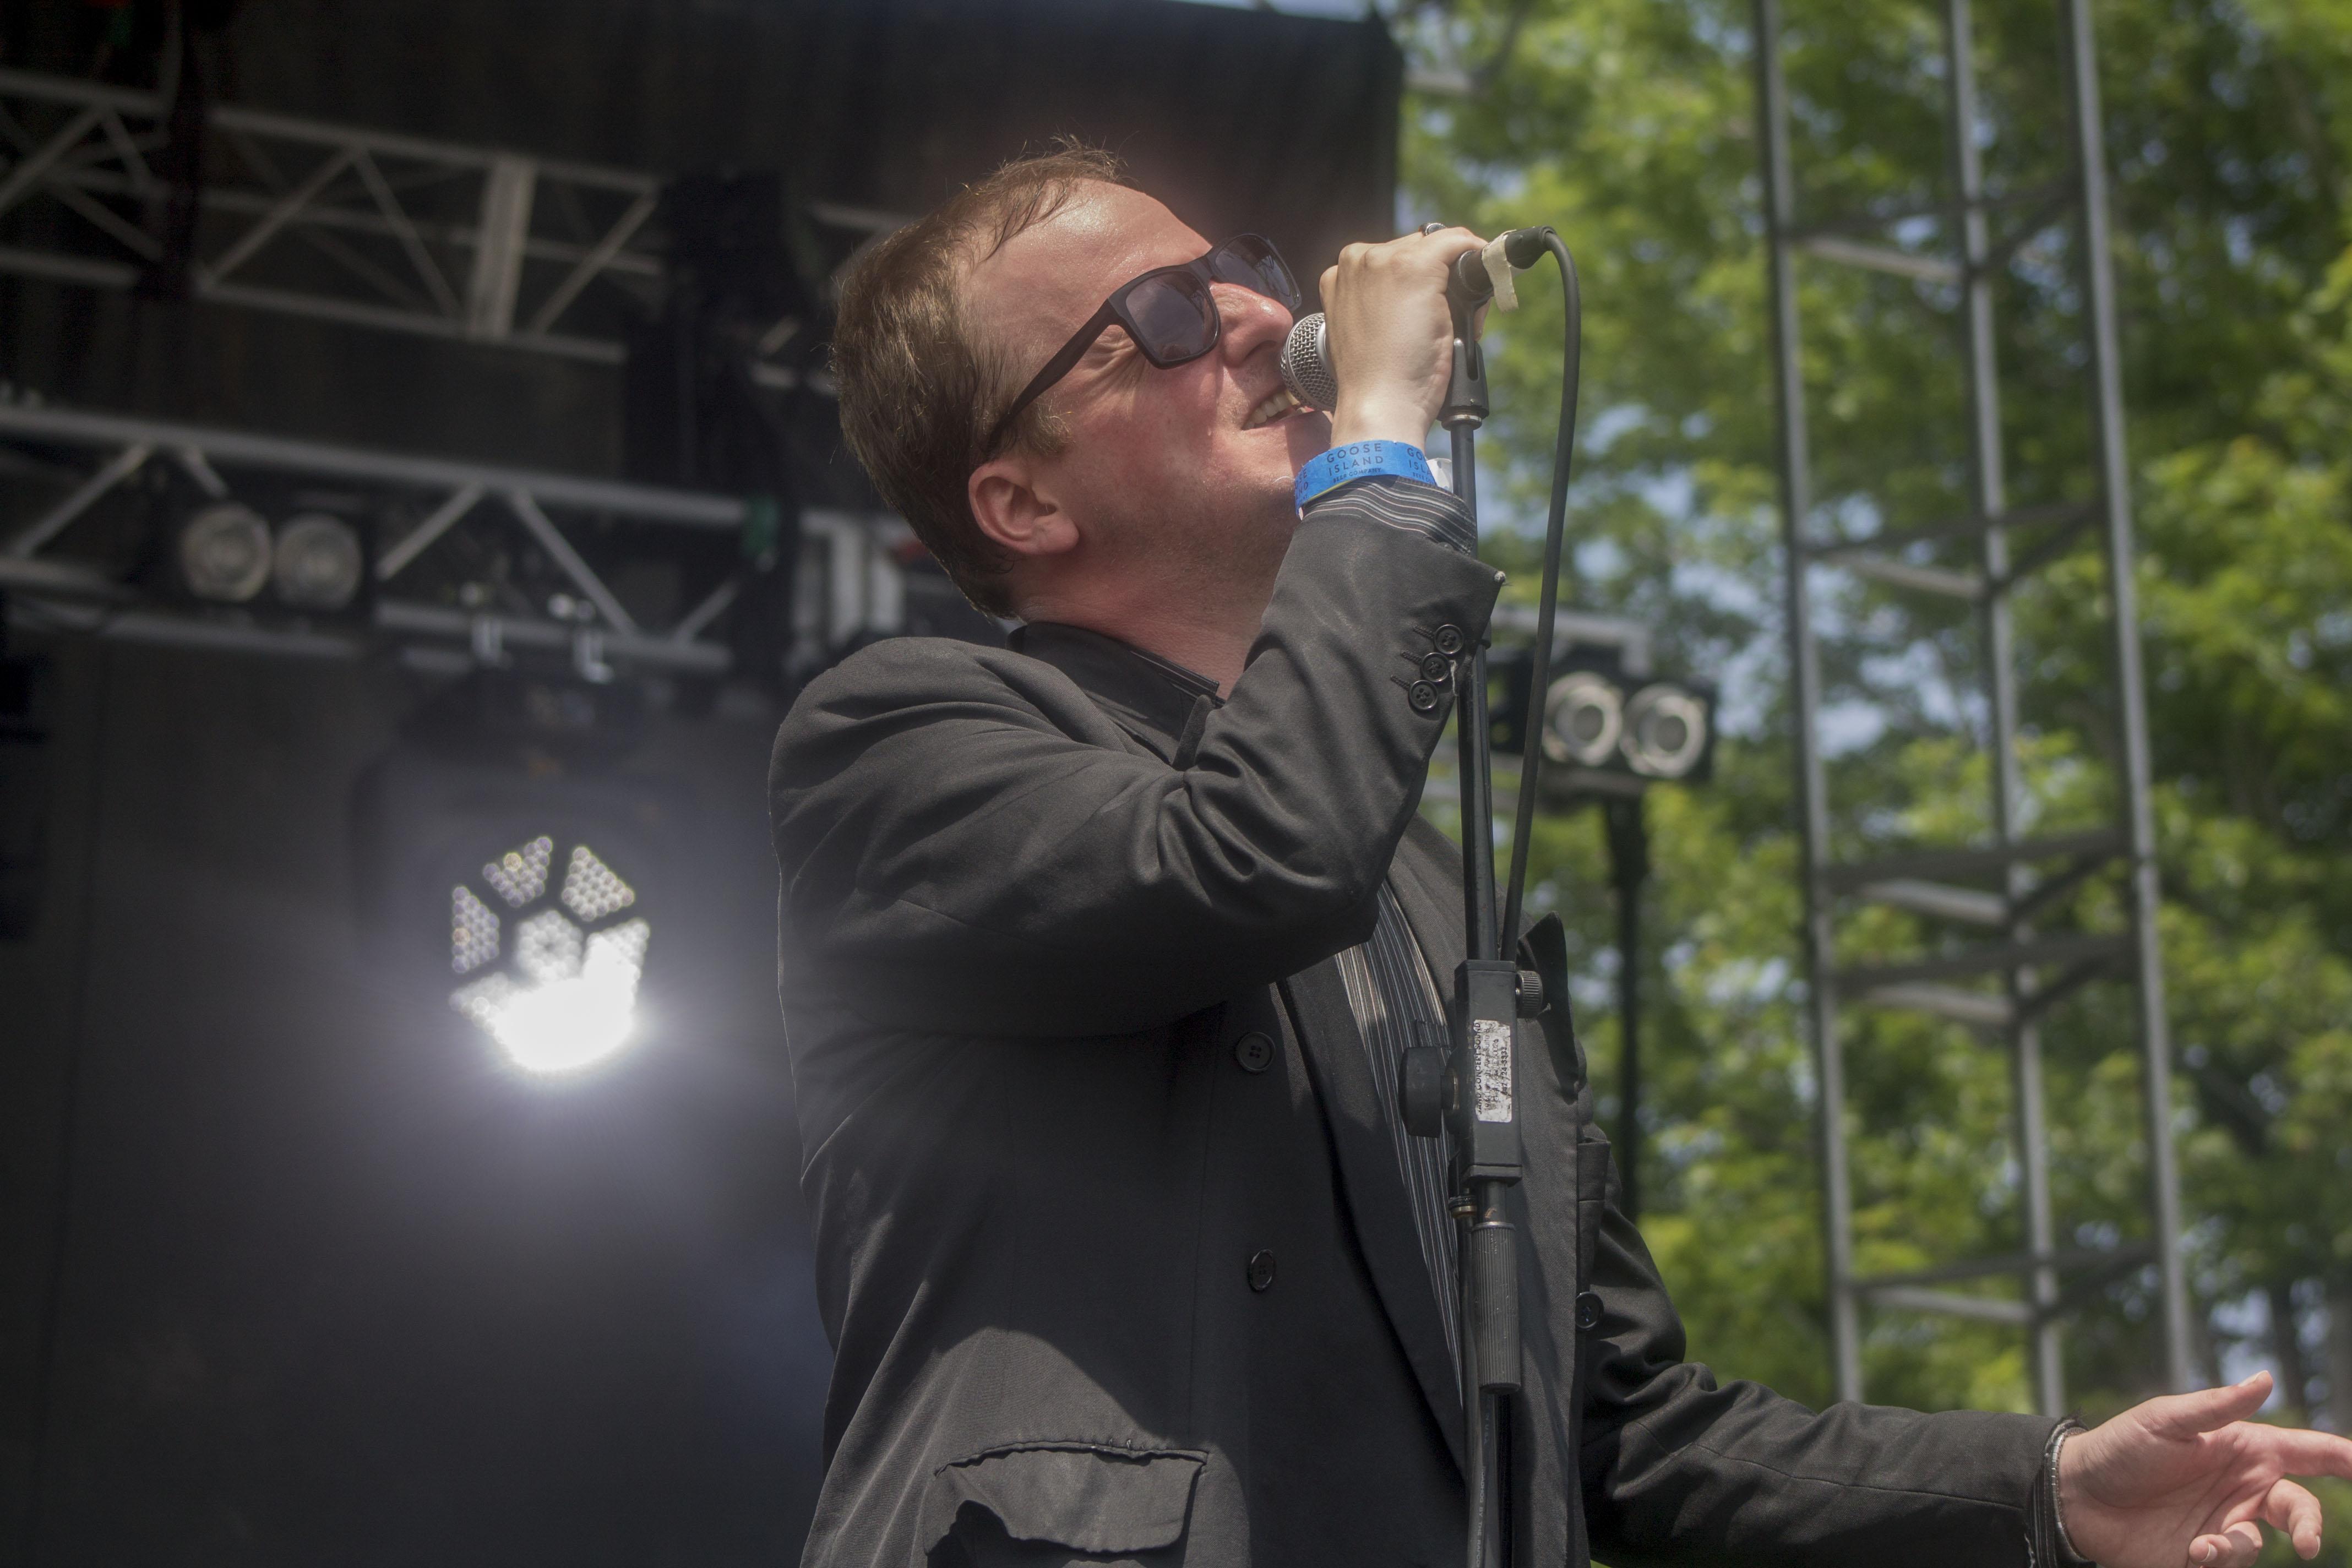 Protomaryr at Pitchfork Festival 2015 shot by Brendan O'Connor